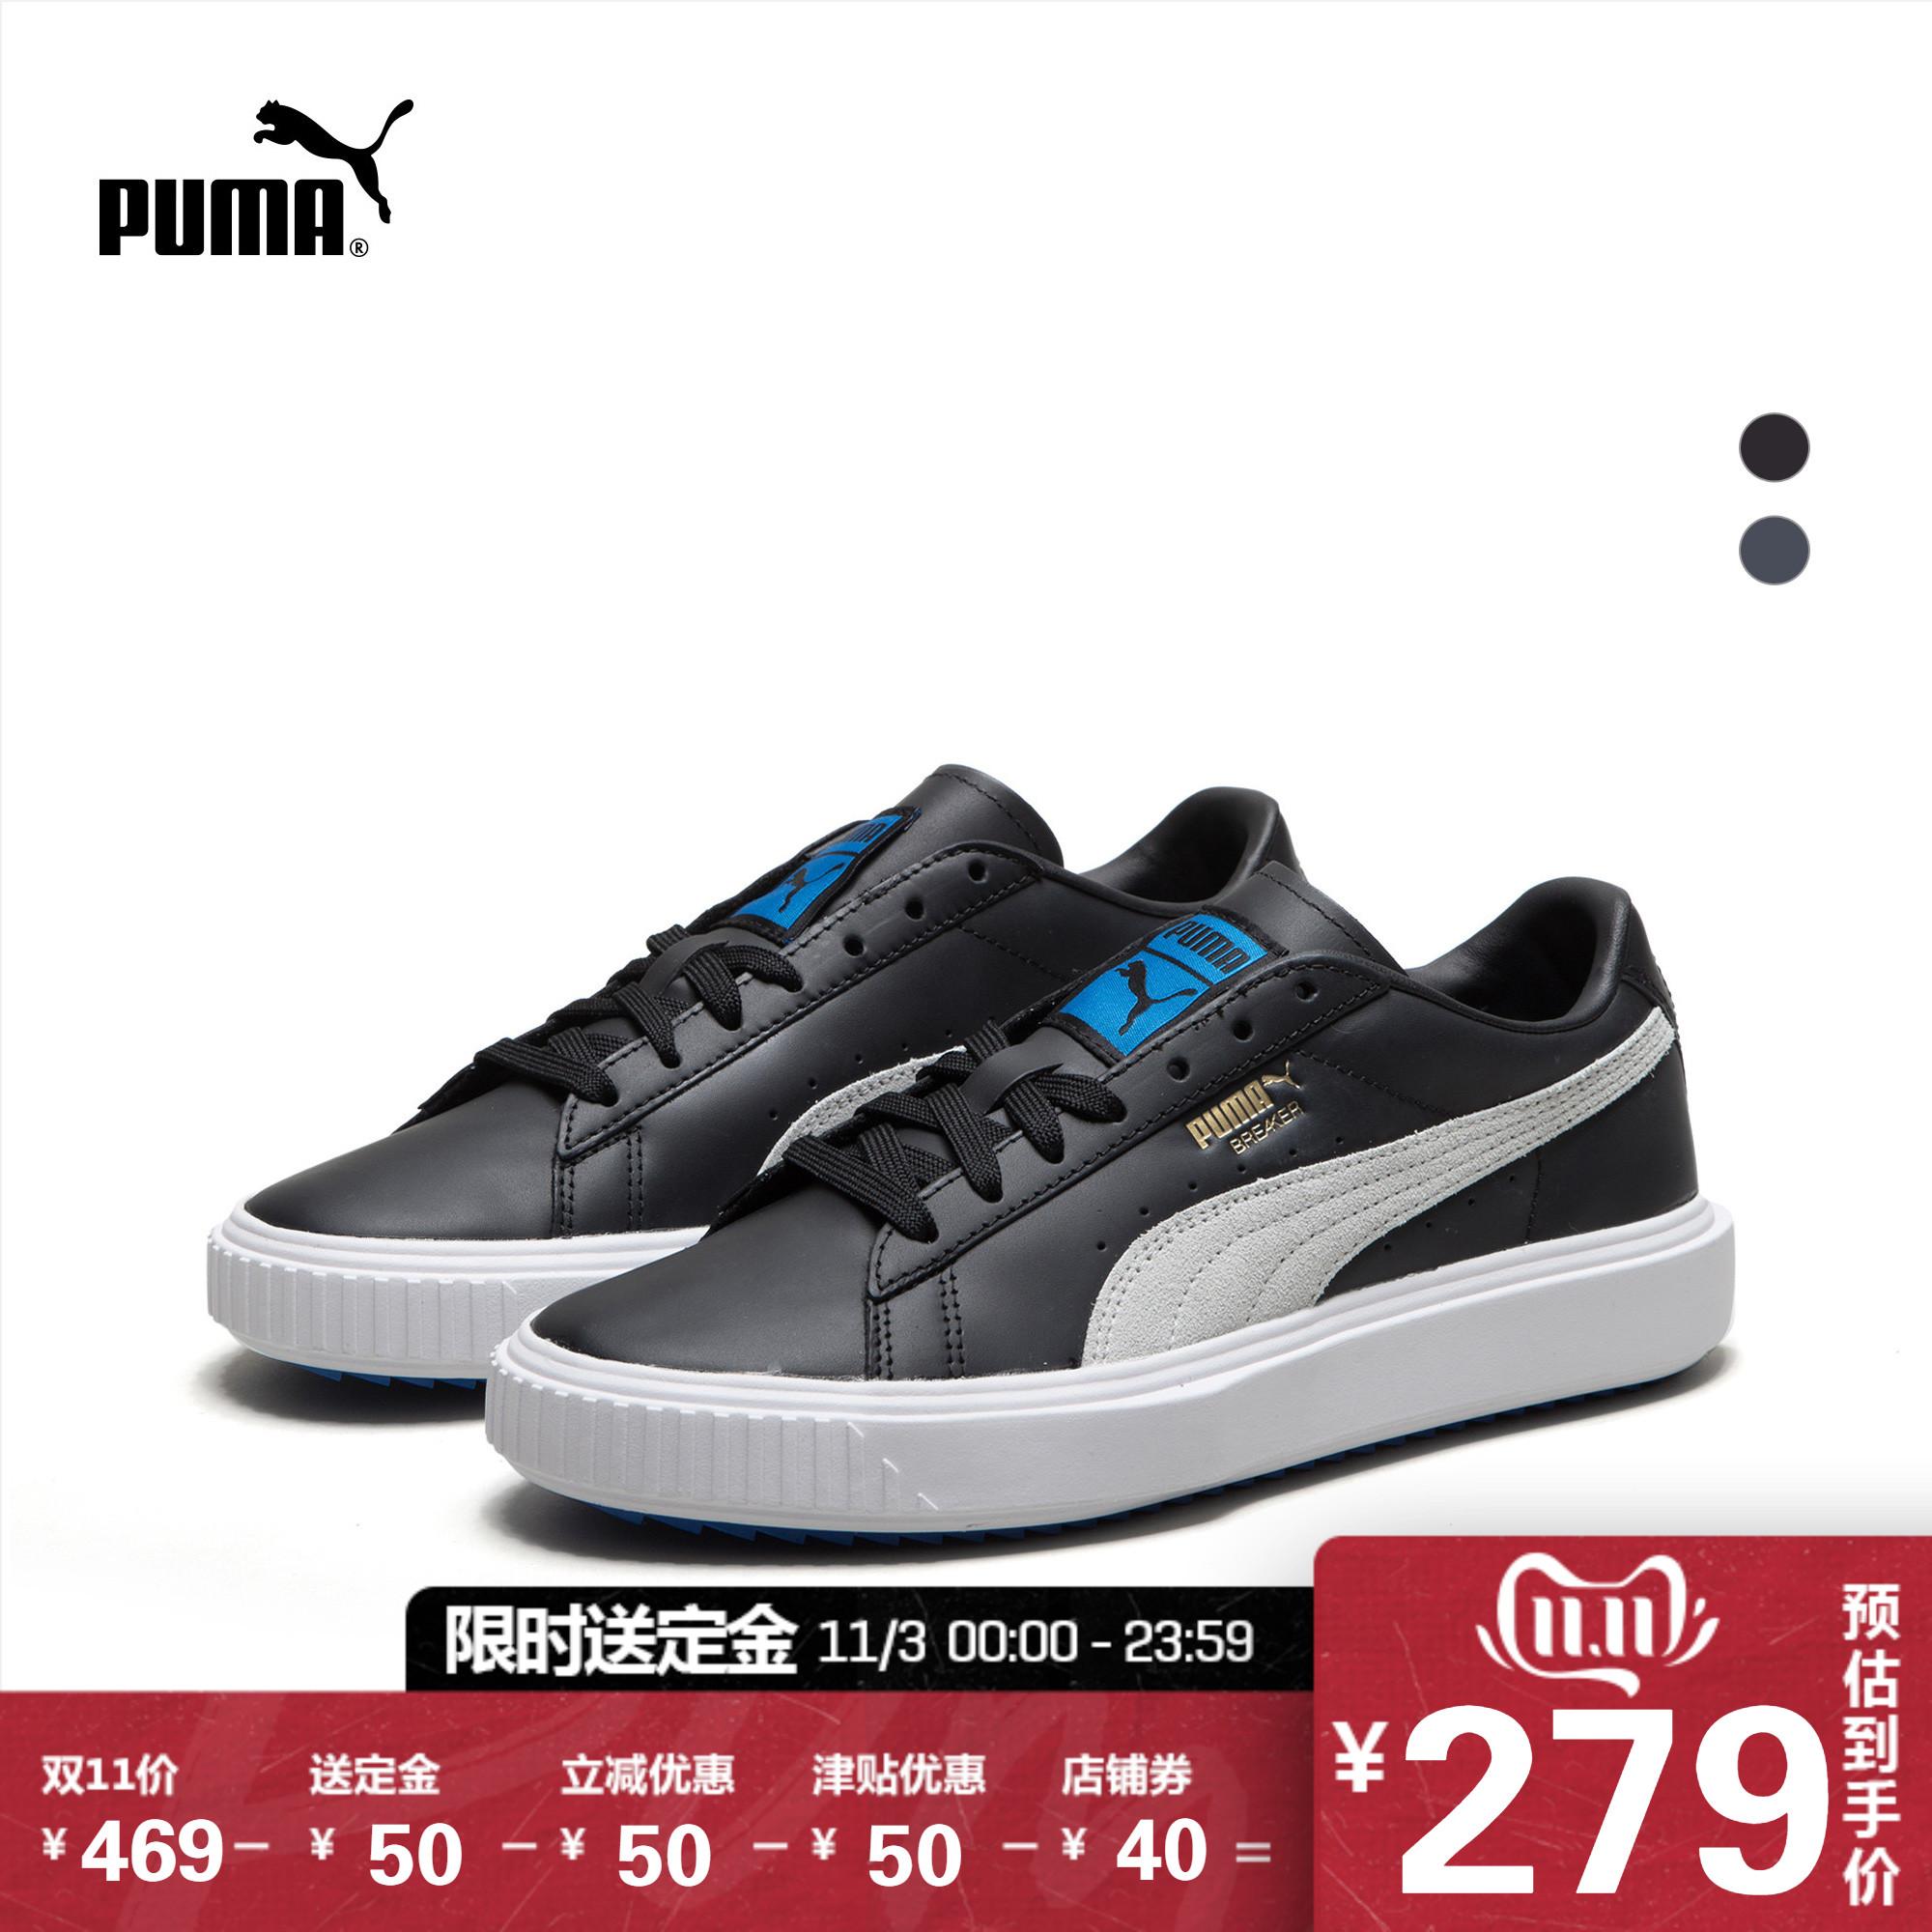 PUMA彪马官方 男女同款休闲鞋 Breaker 369191 thumbnail